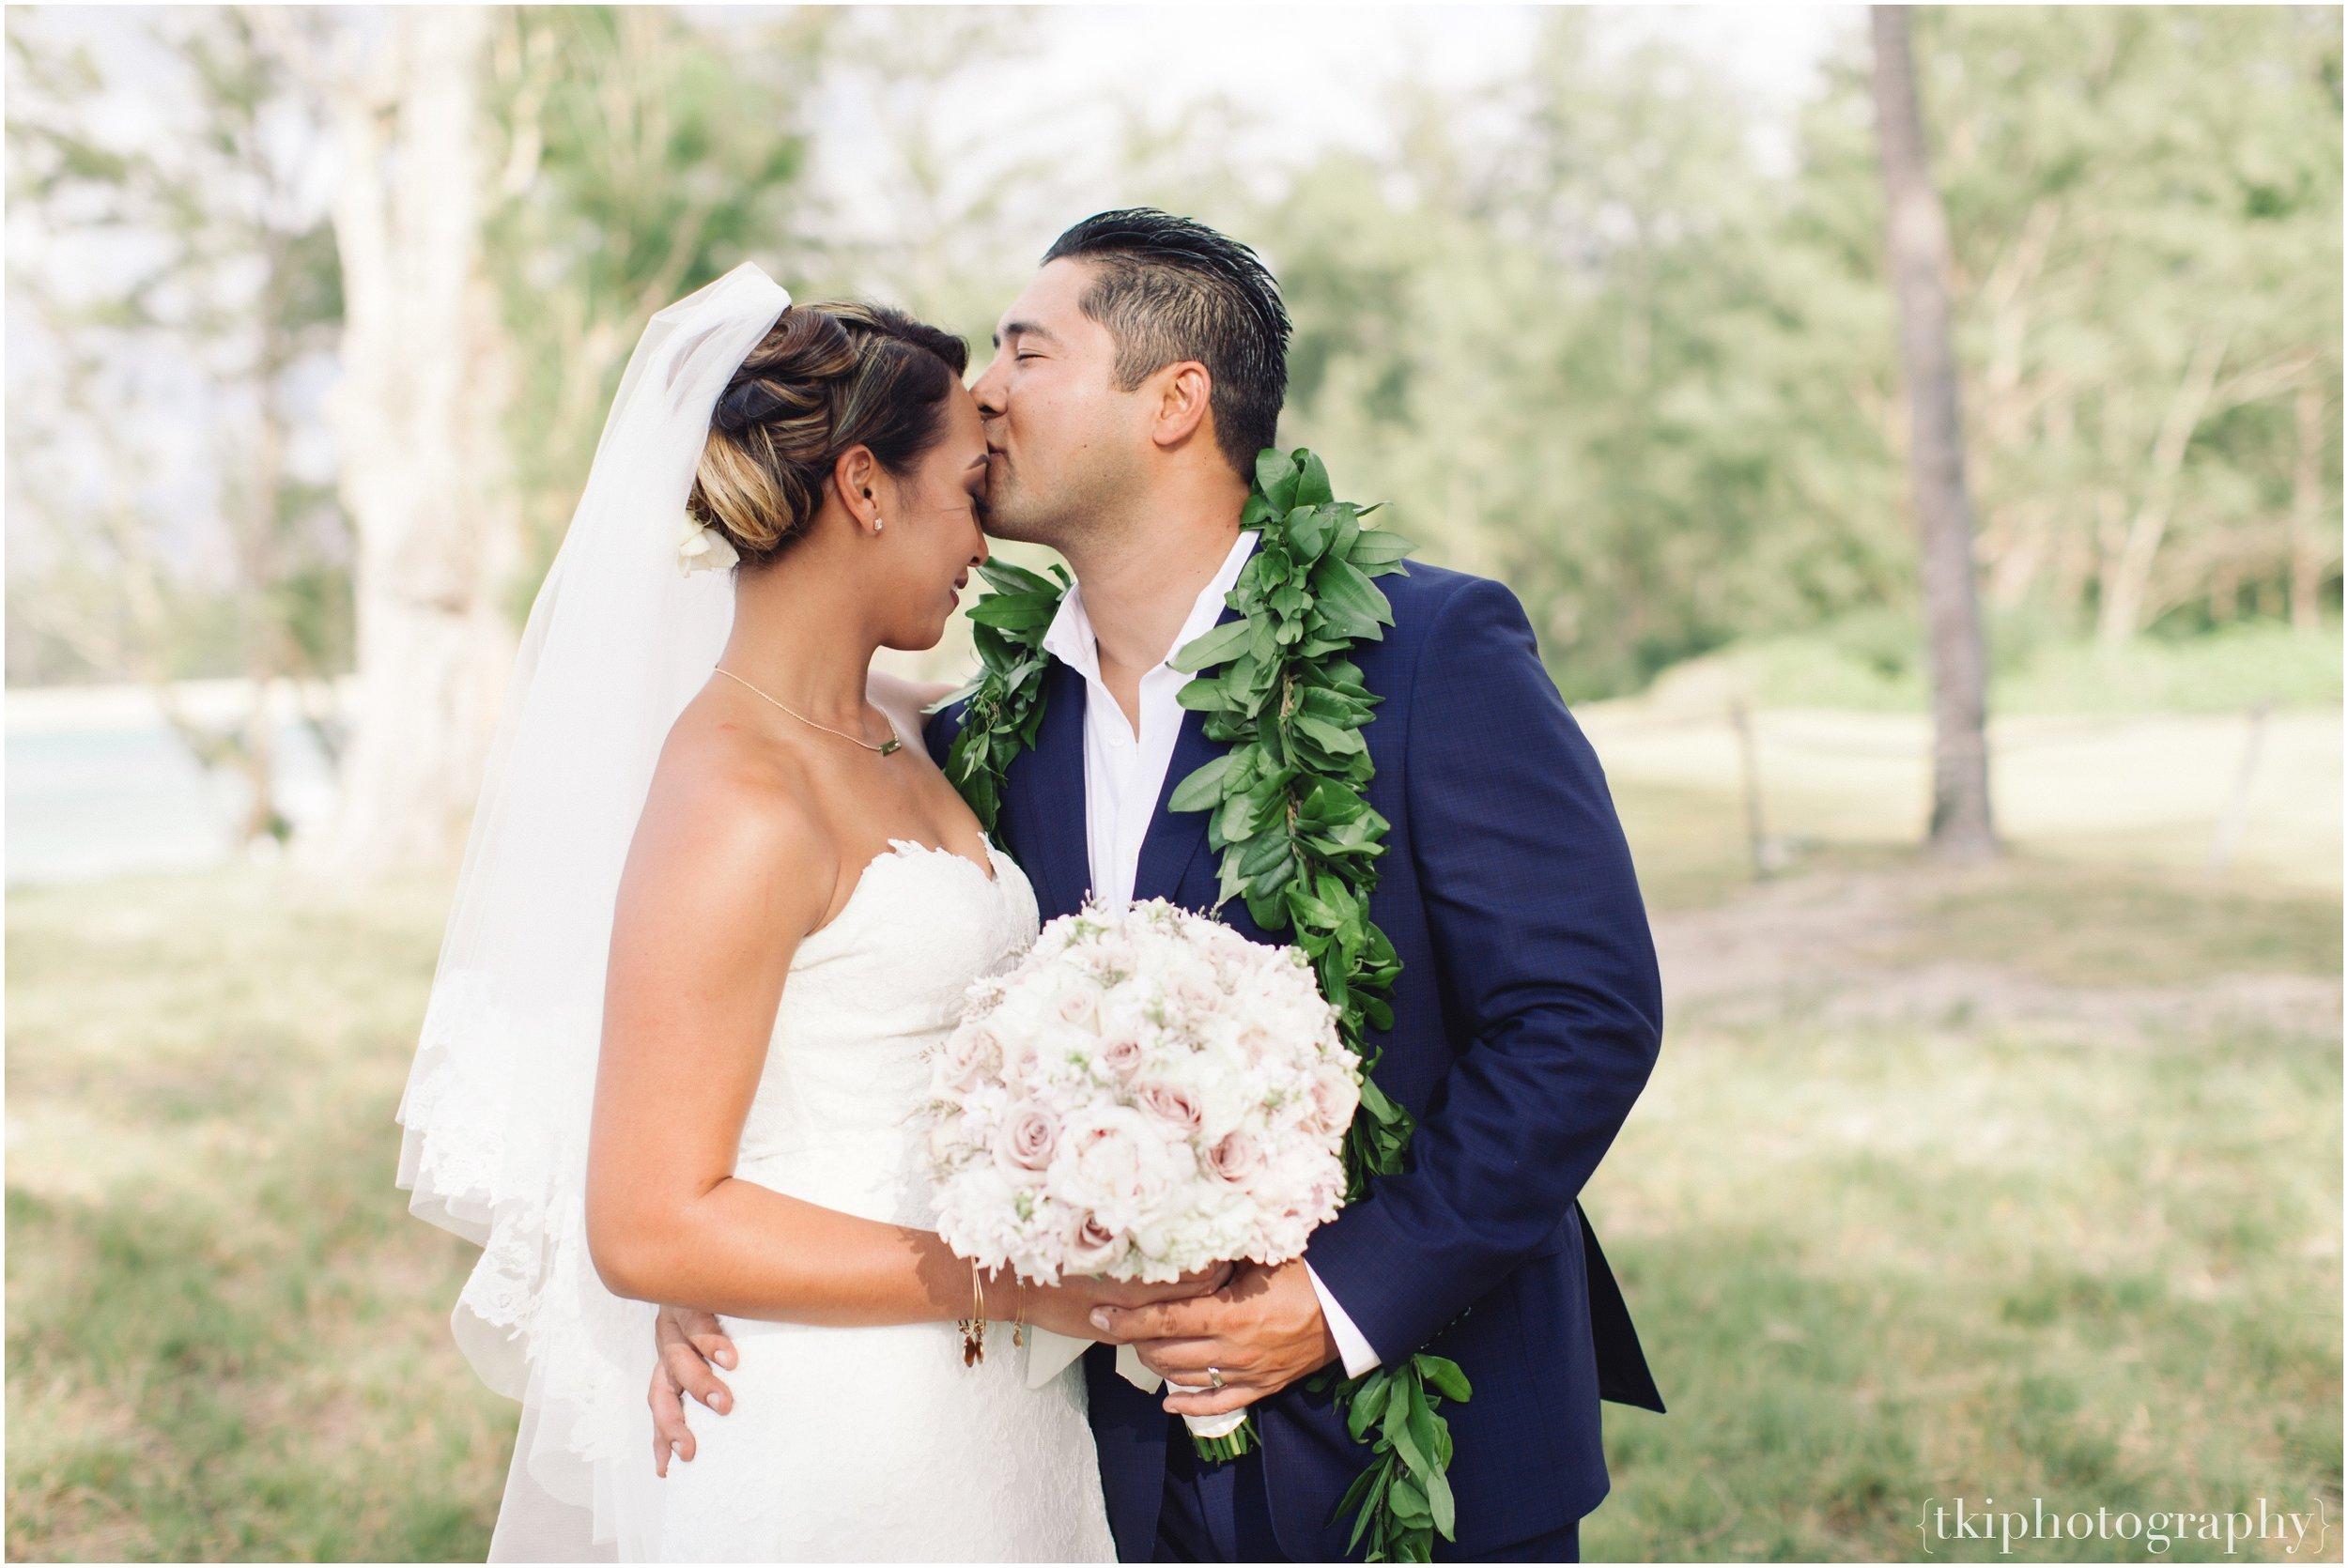 Oahu-Destination-Wedding-Beach_0099.jpg